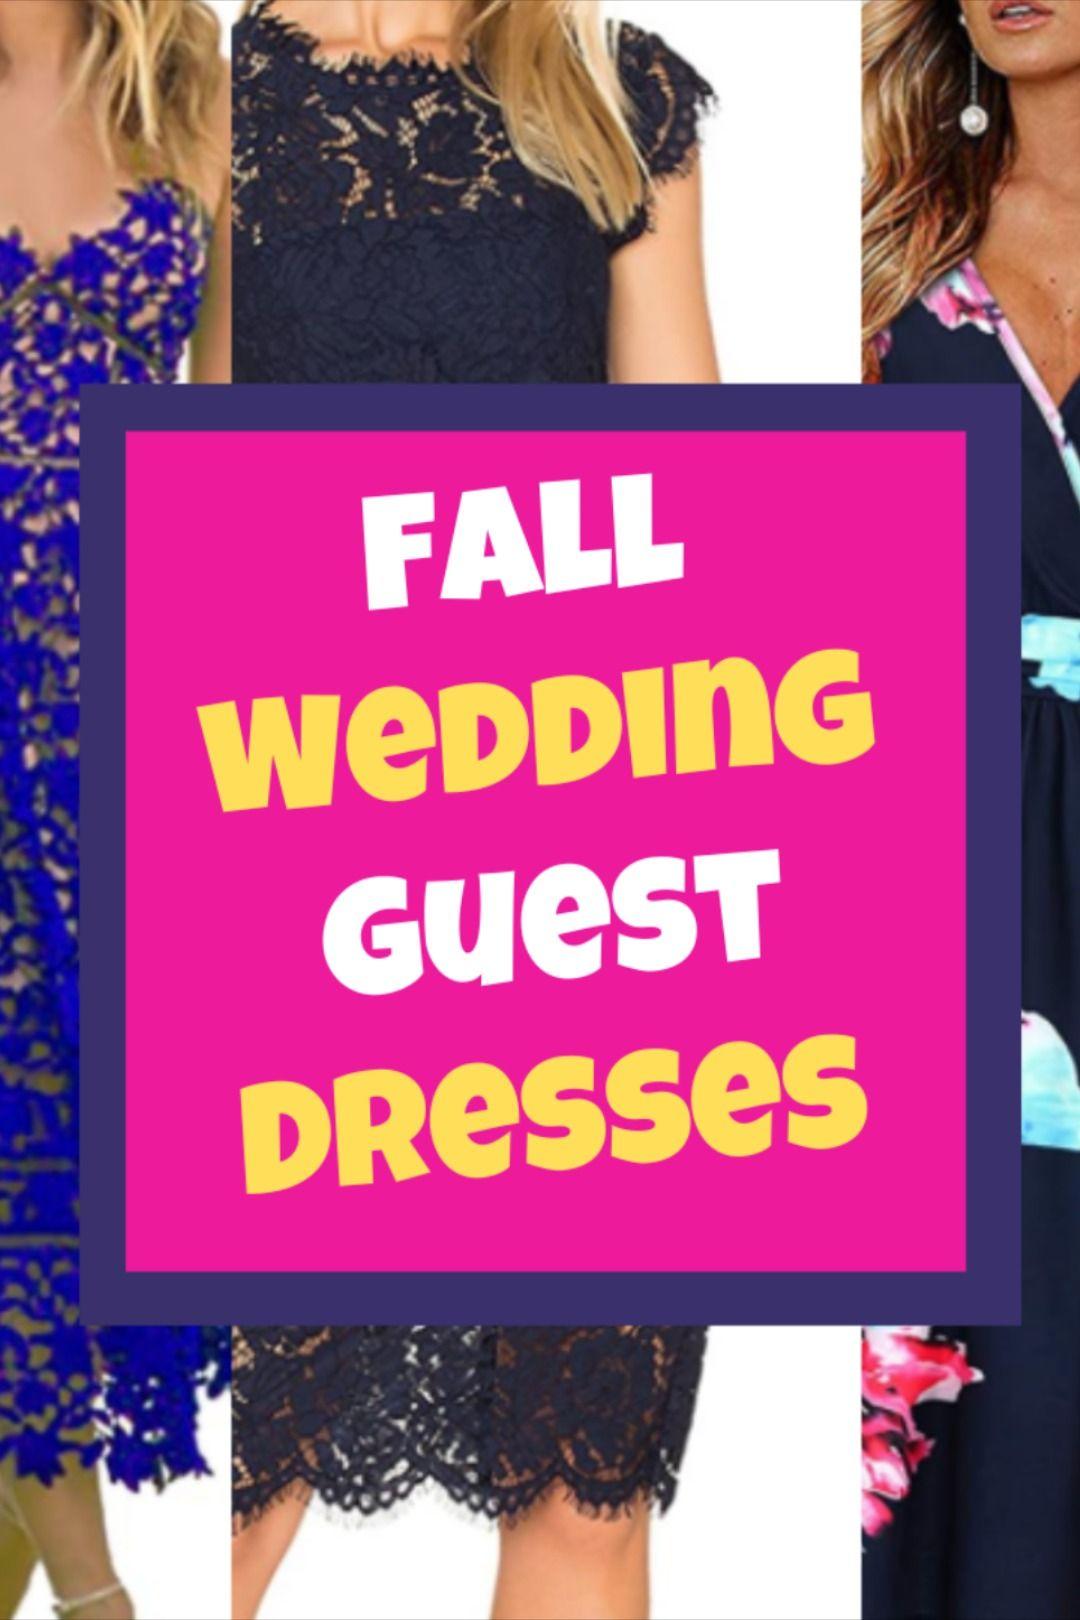 Fall Wedding Guest Dresses 30 On Amazon Fall Wedding Guest Wedding Guest Dress Fall Wedding Guest Dress [ 1620 x 1080 Pixel ]